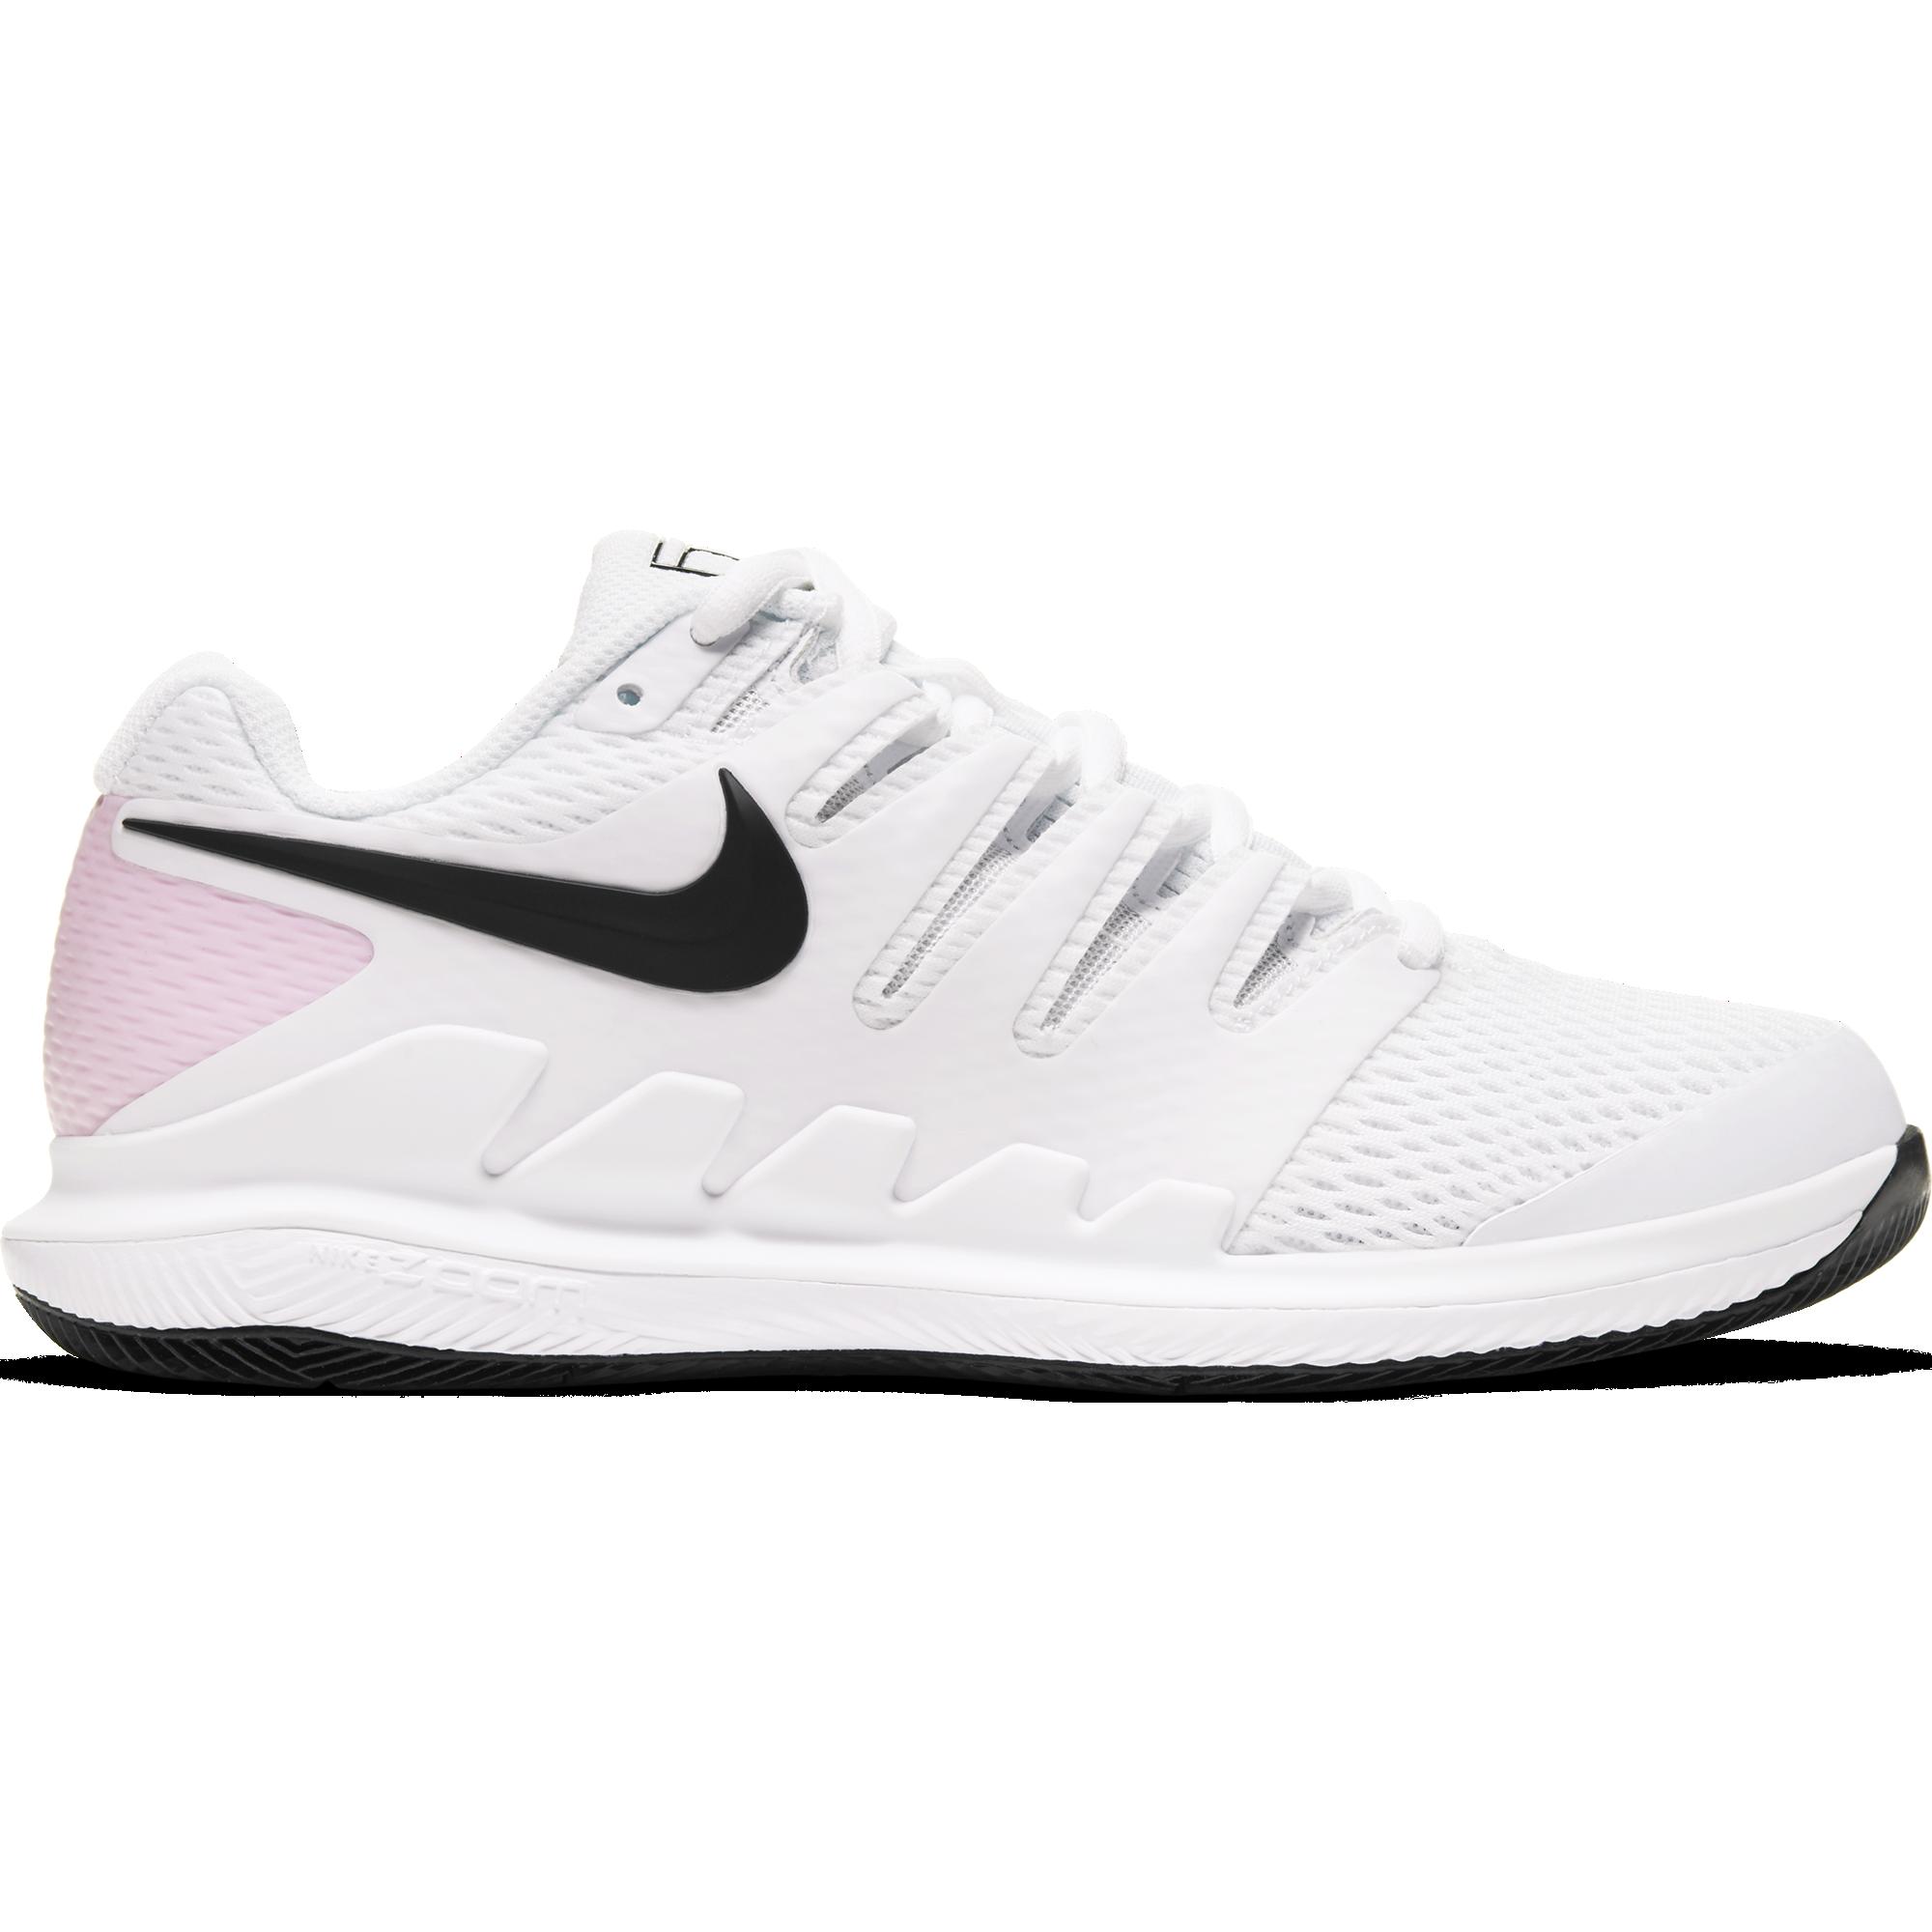 Nikecourt Air Zoom Vapor X Women S Tennis Shoe White Pink Pga Tour Superstore